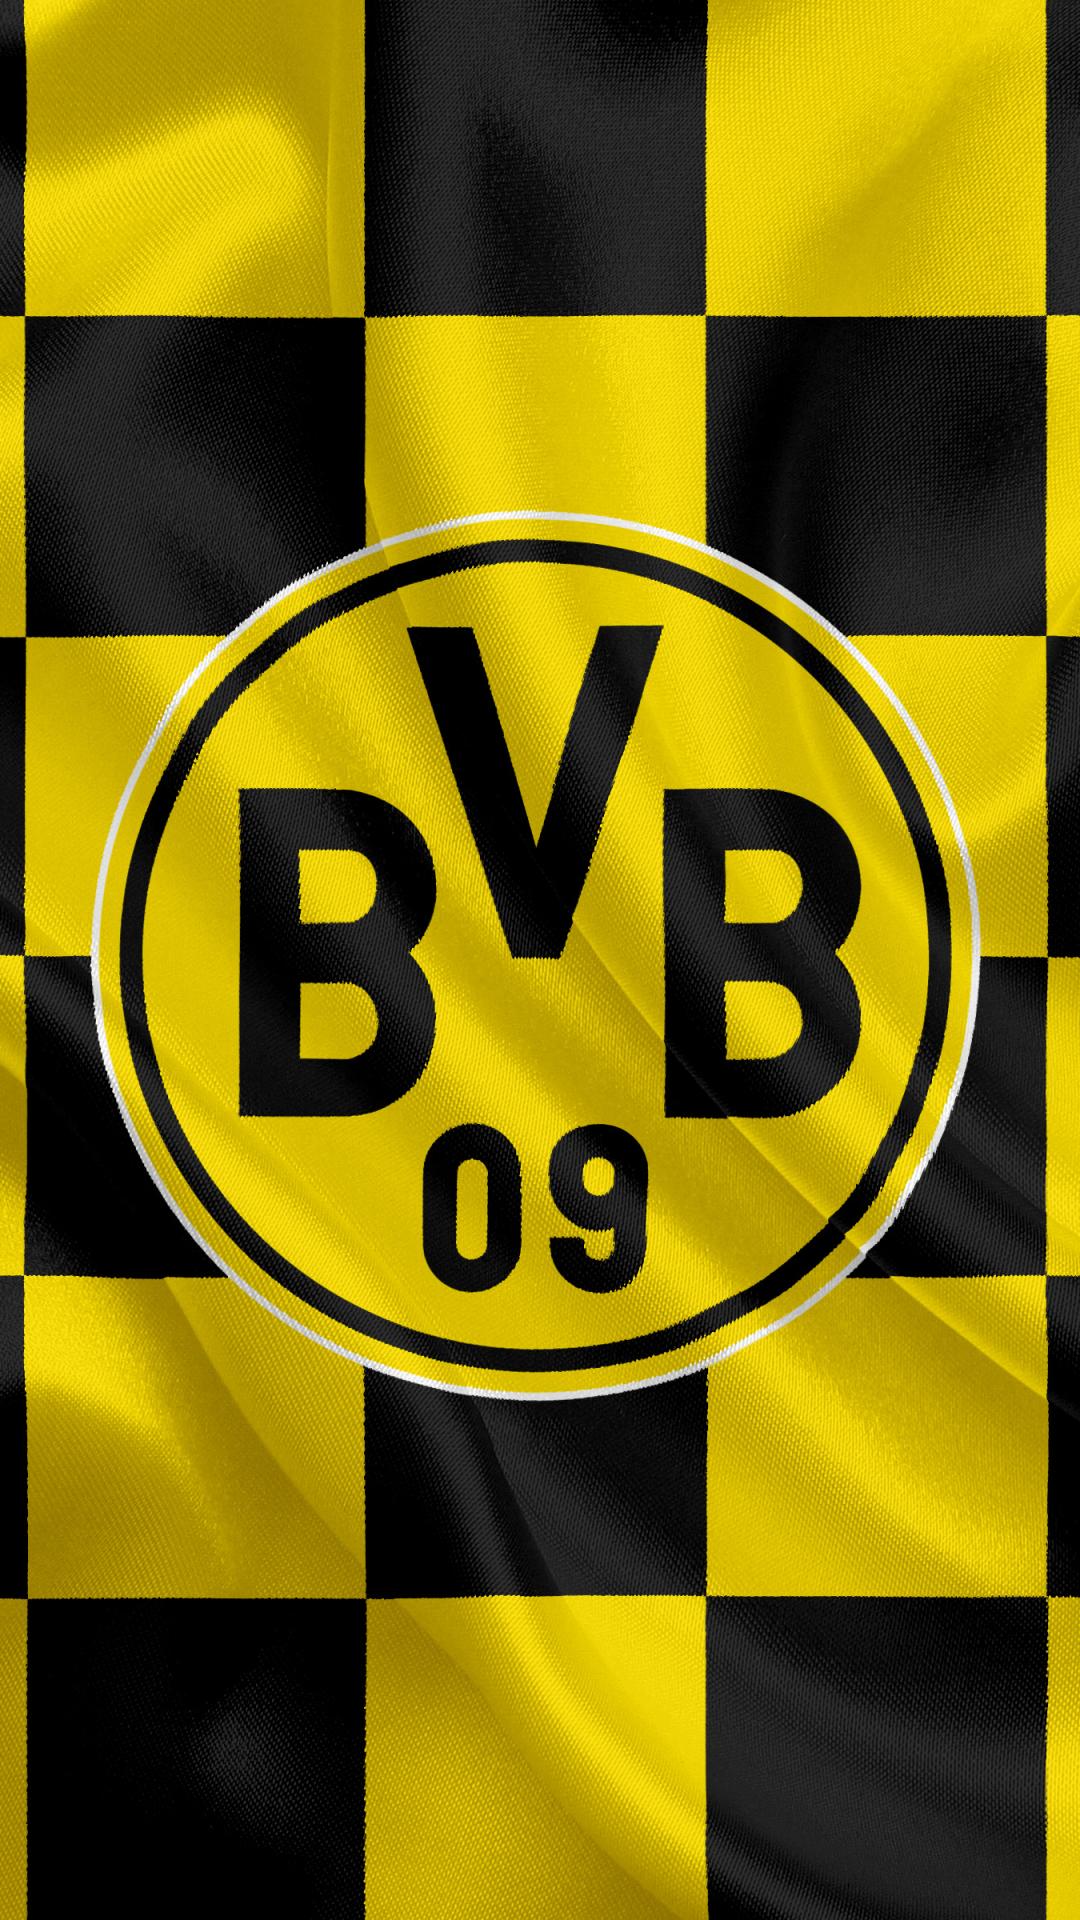 Wallpaper Borussia Dortmund Iphone 1080x1920 Download Hd Wallpaper Wallpapertip